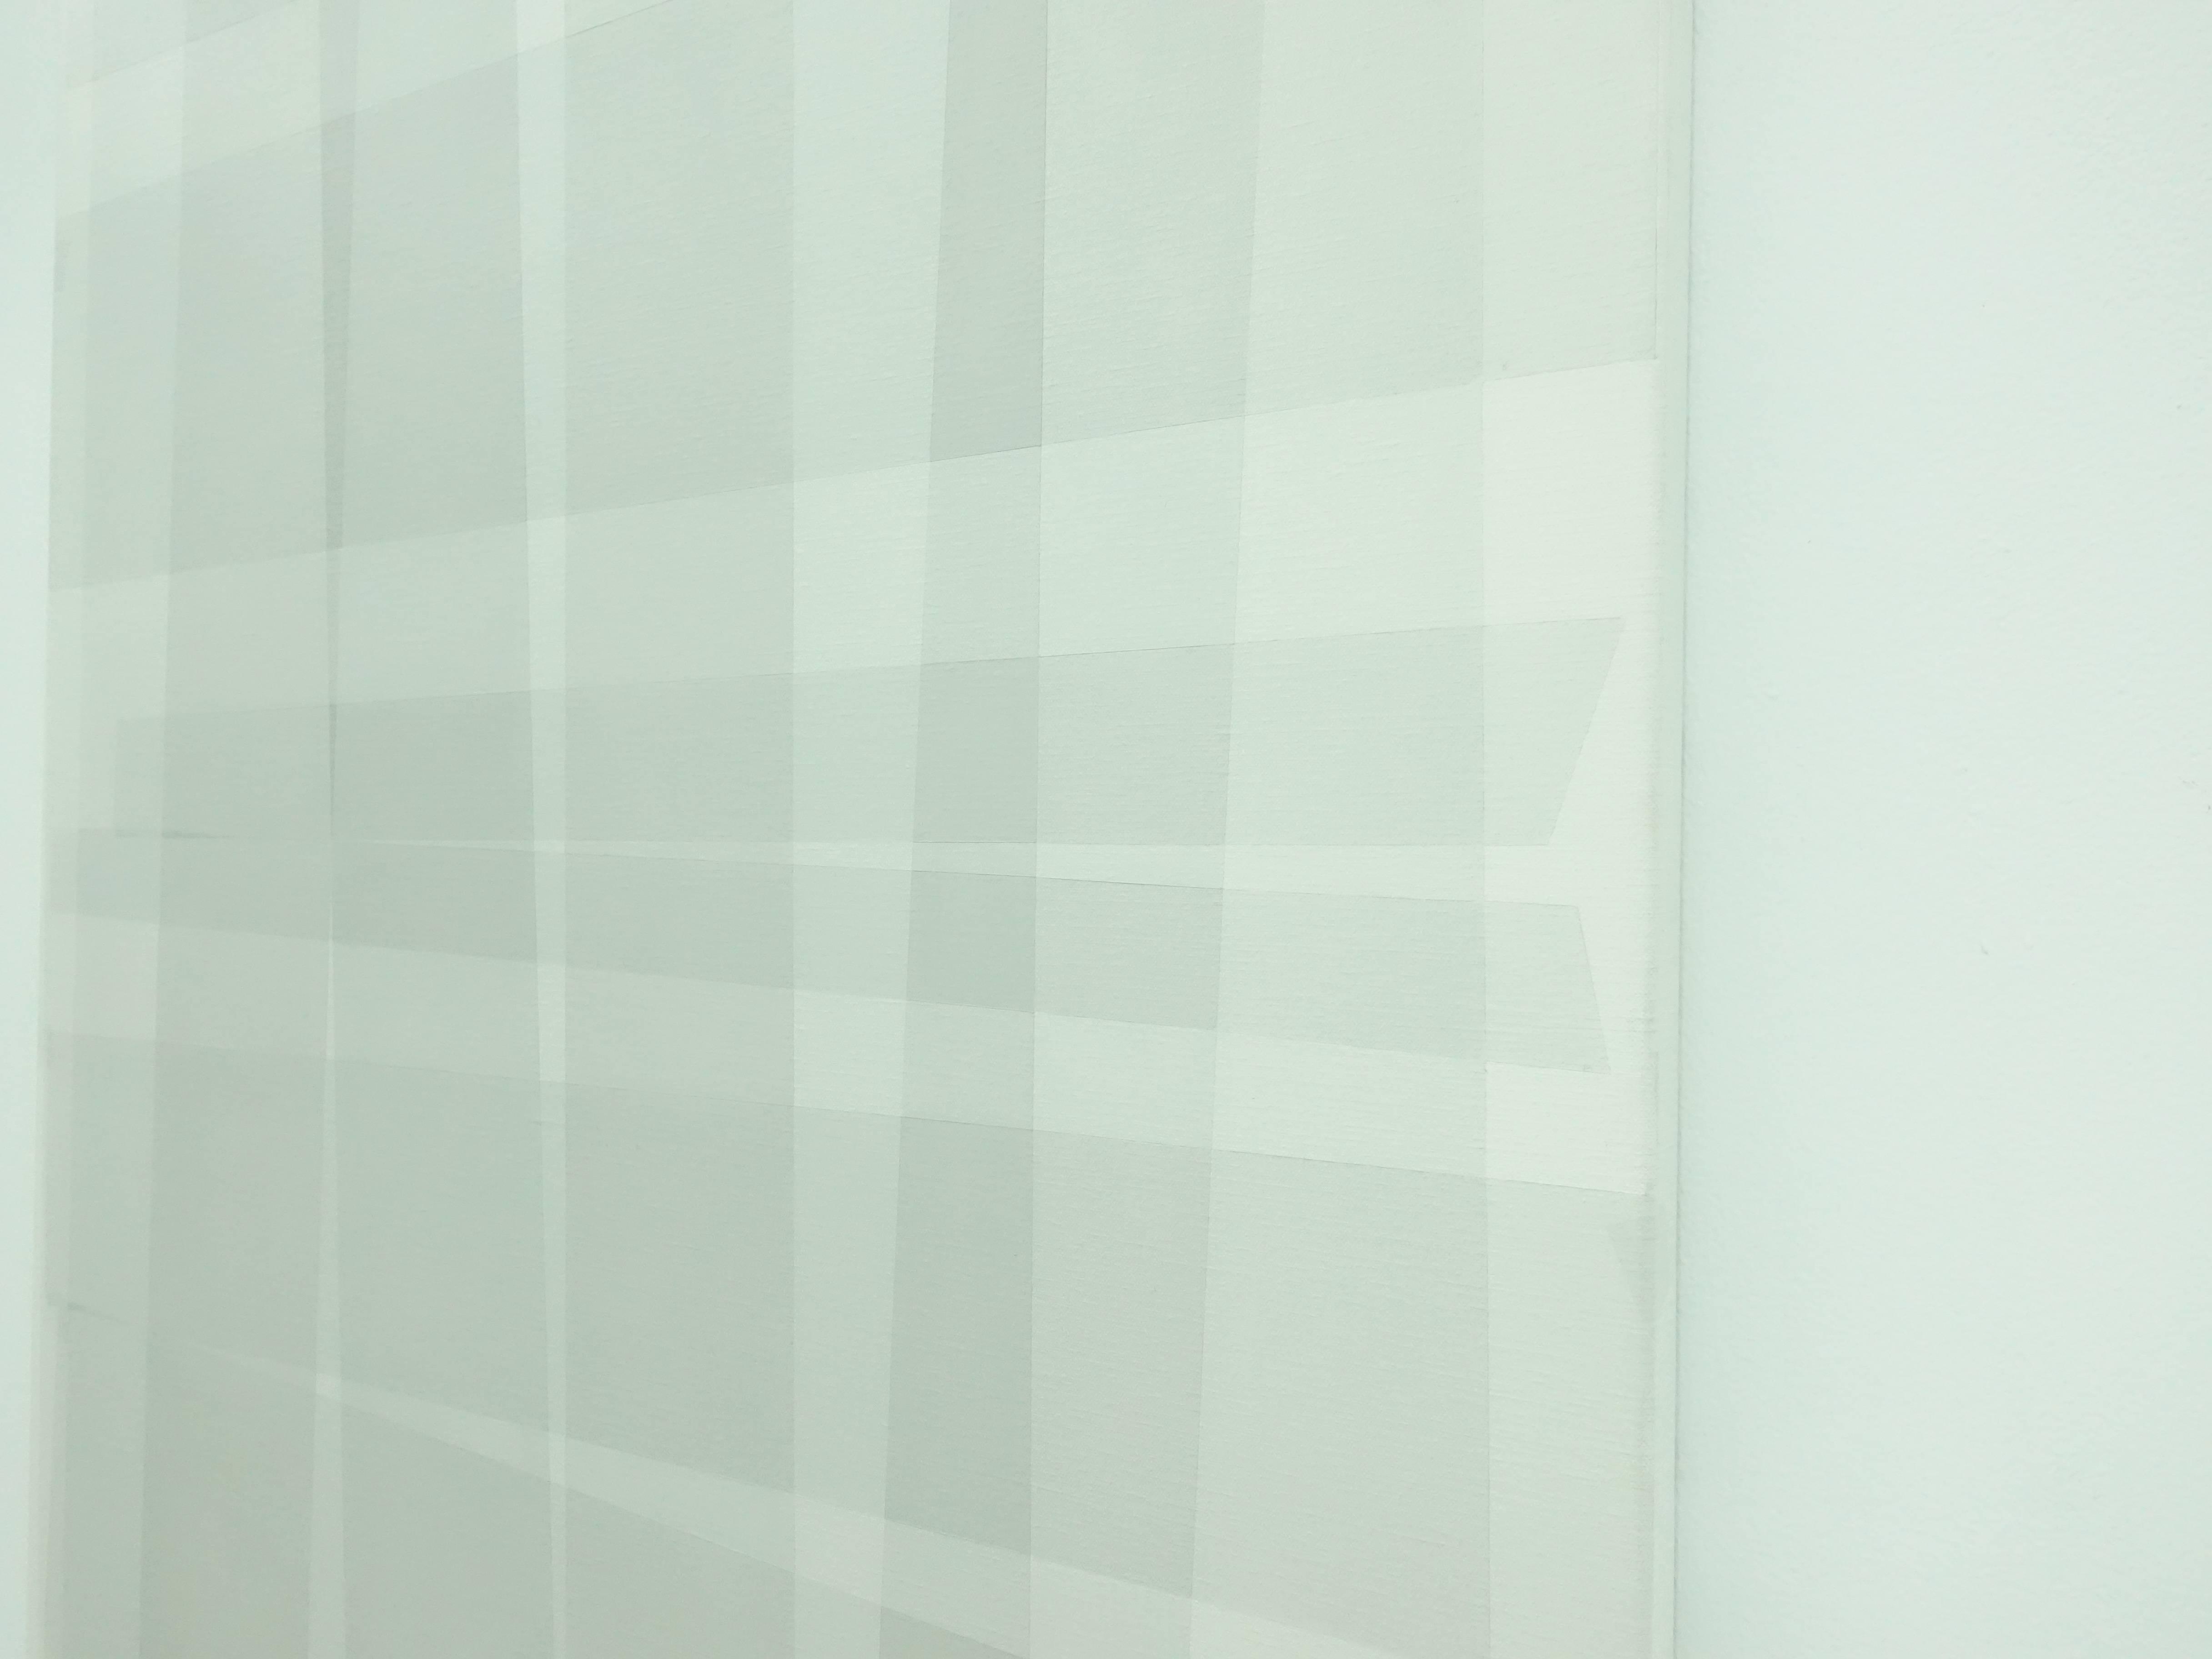 Kees Goudzwaard,《Transparent on white透徹於白之上》細節,Oil on canvas,100 x 75 cm,2019。